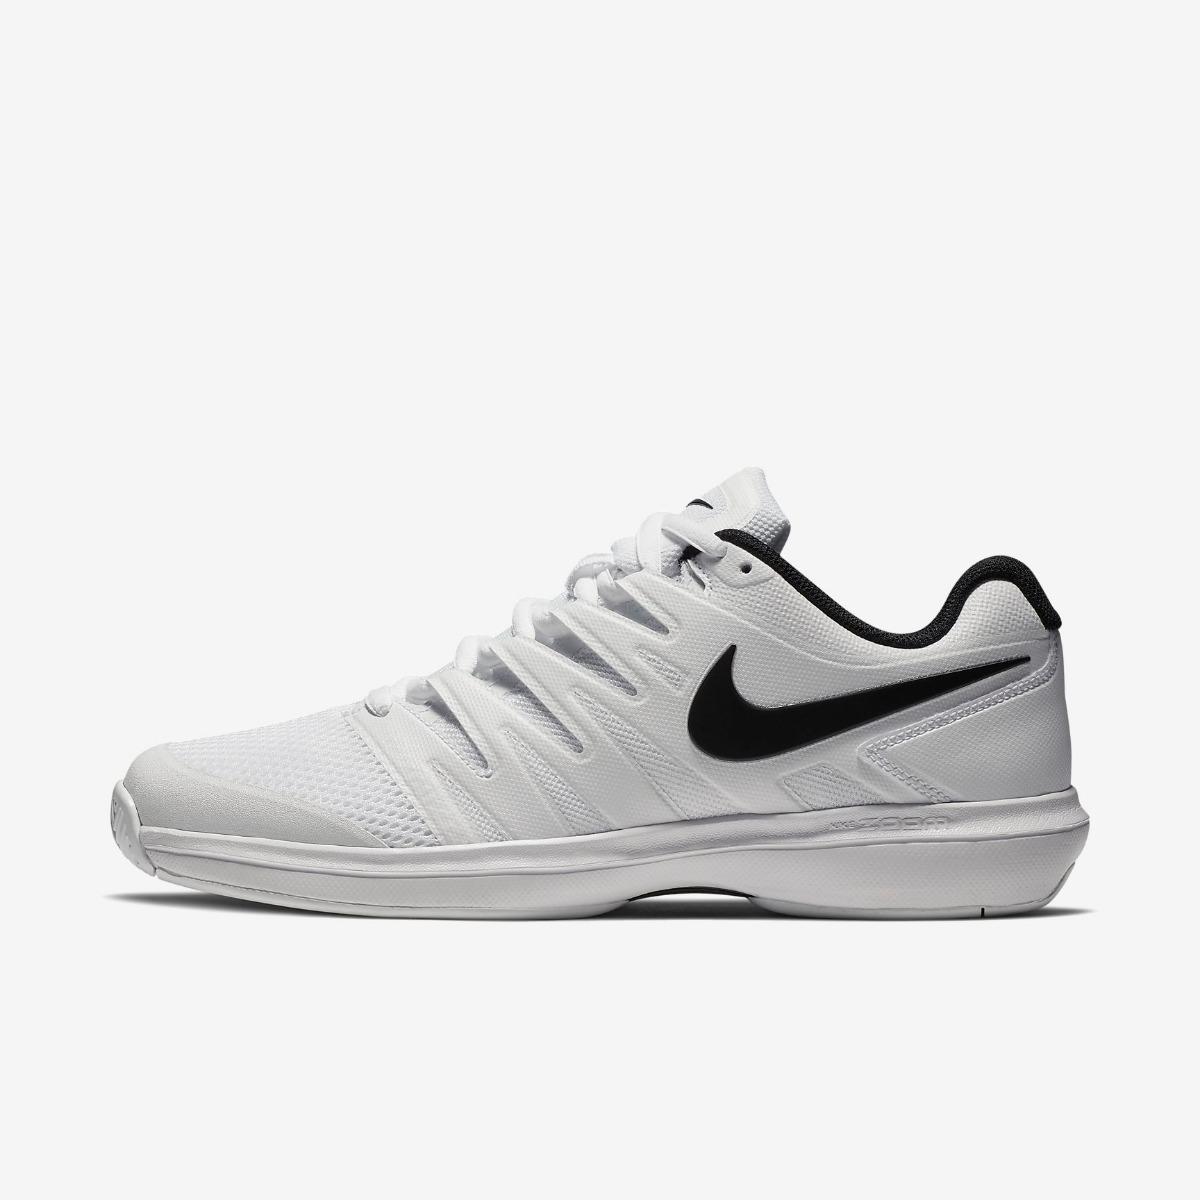 ace22a8501b zapatos para jugar tenis nike court air zoom prestige hard. Cargando zoom.